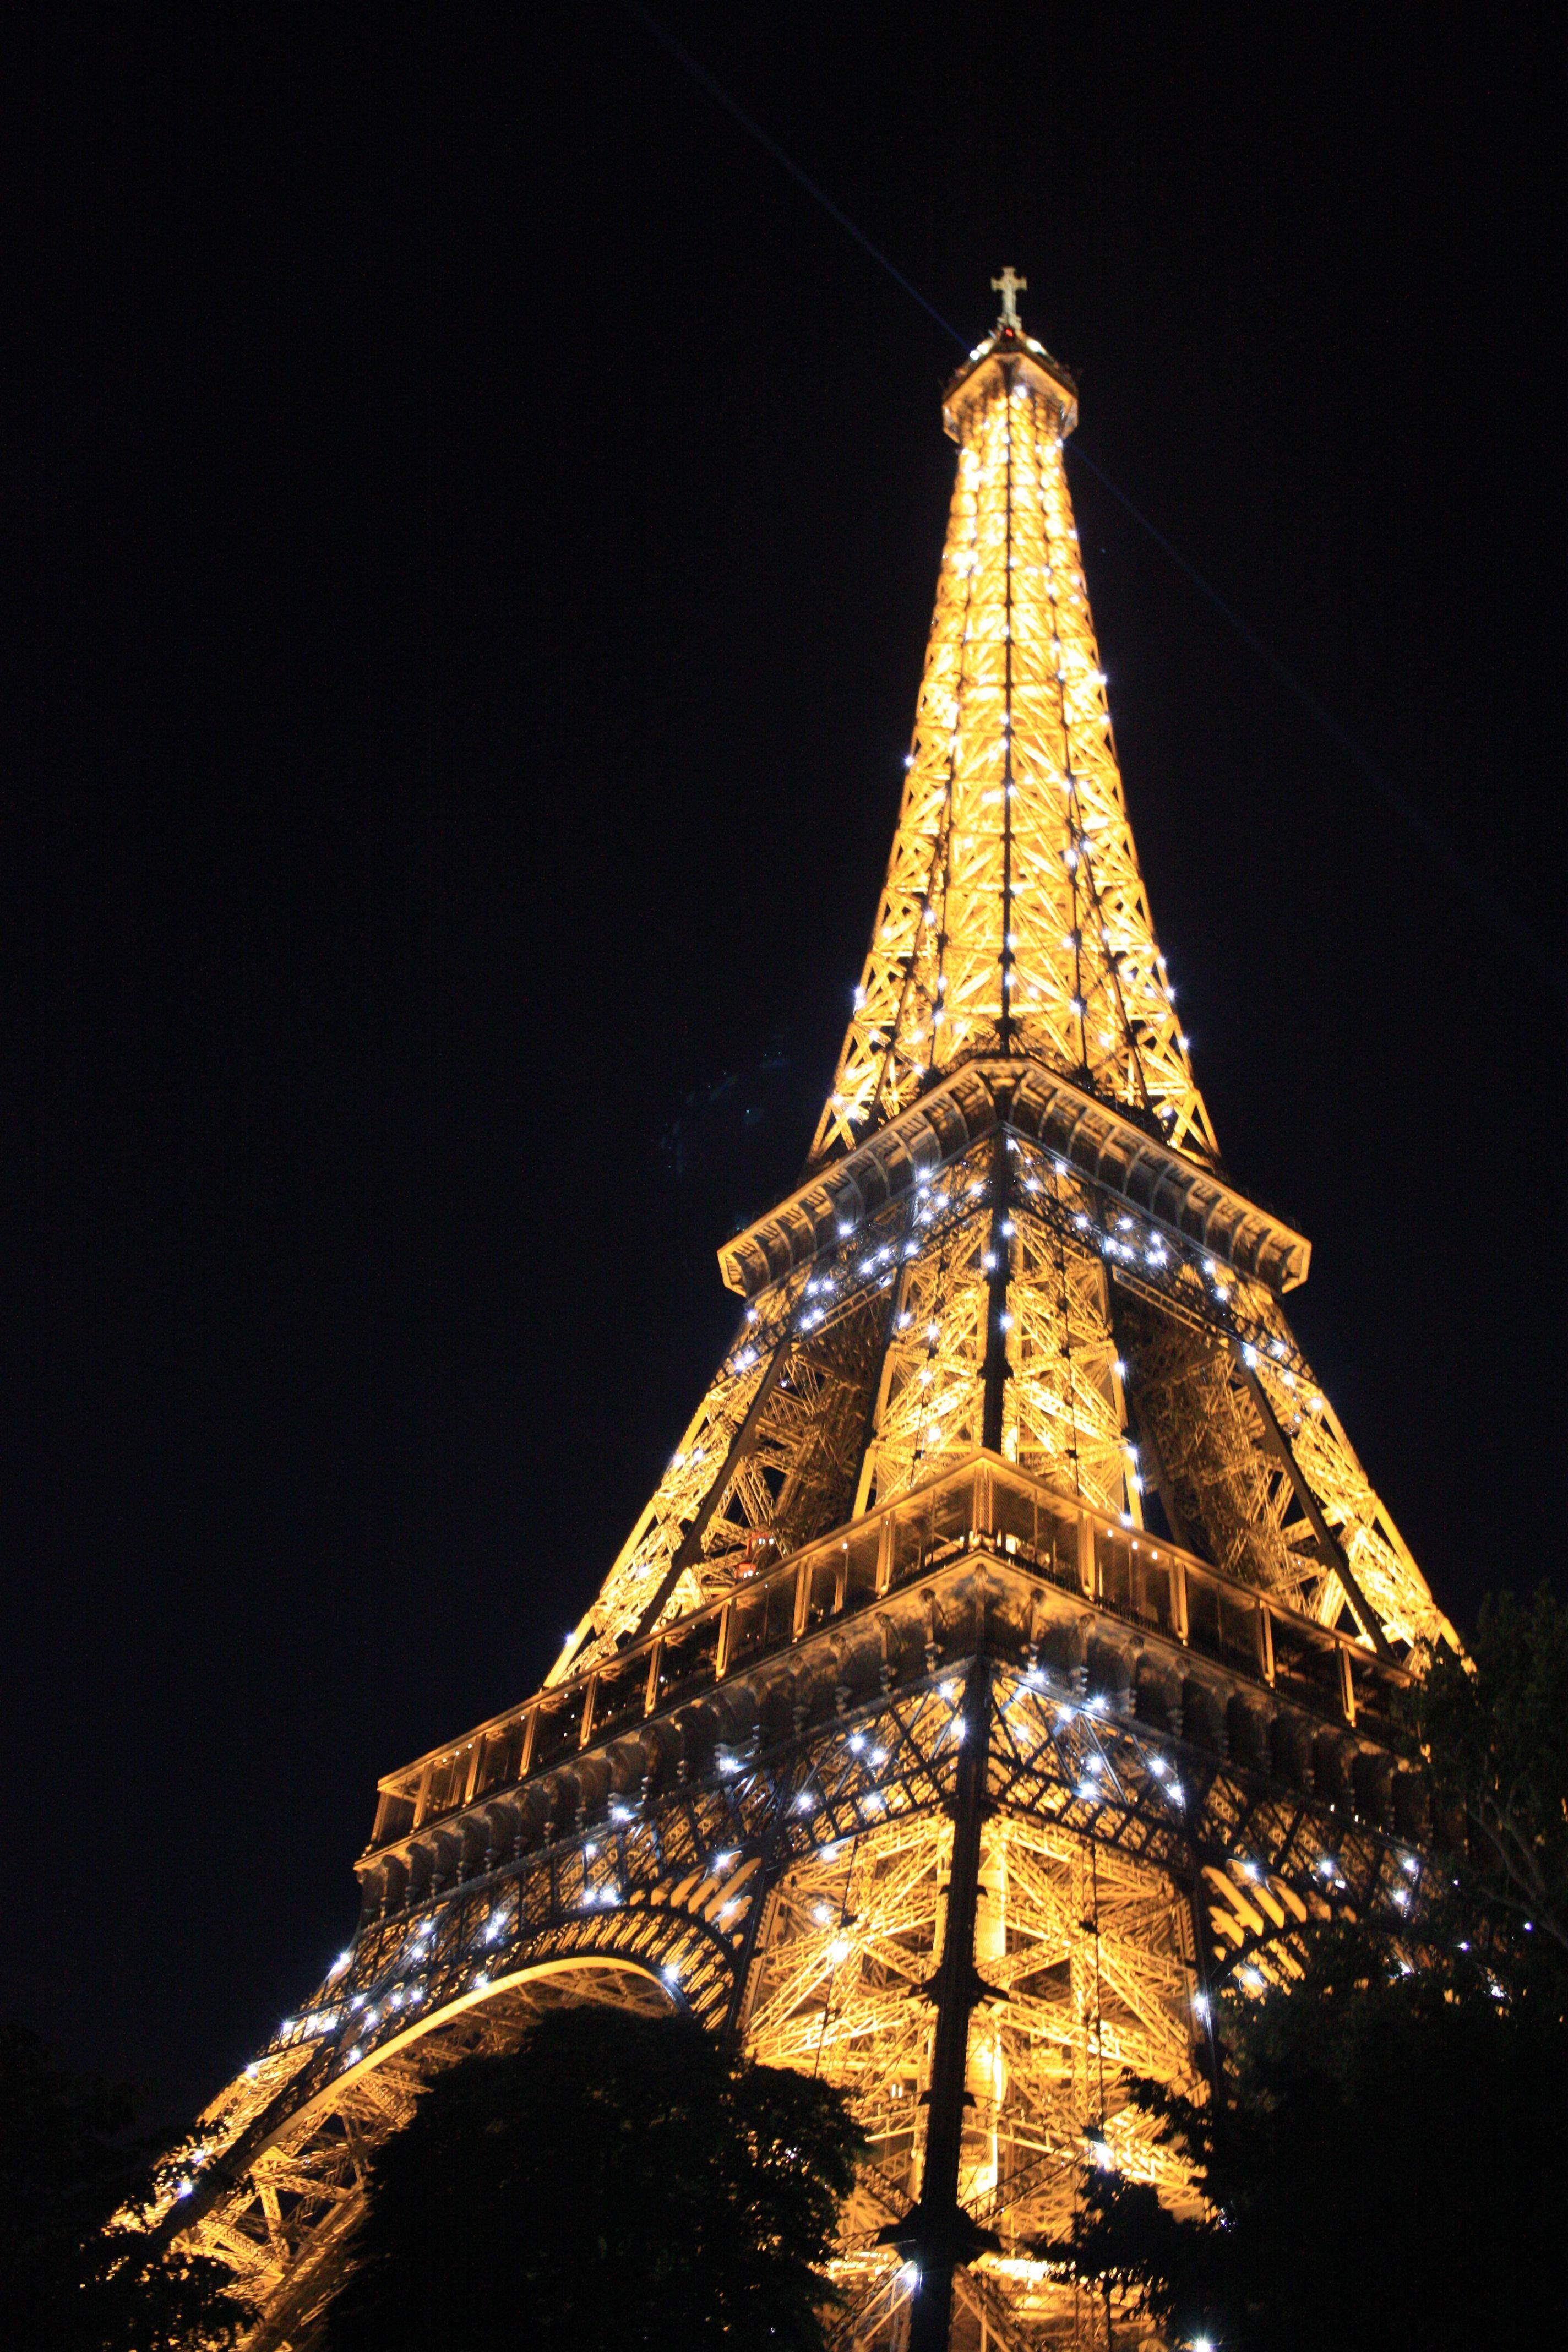 Tour Eiffel Eiffel Tower At Night Tour Eiffel Paris Eiffel Tower